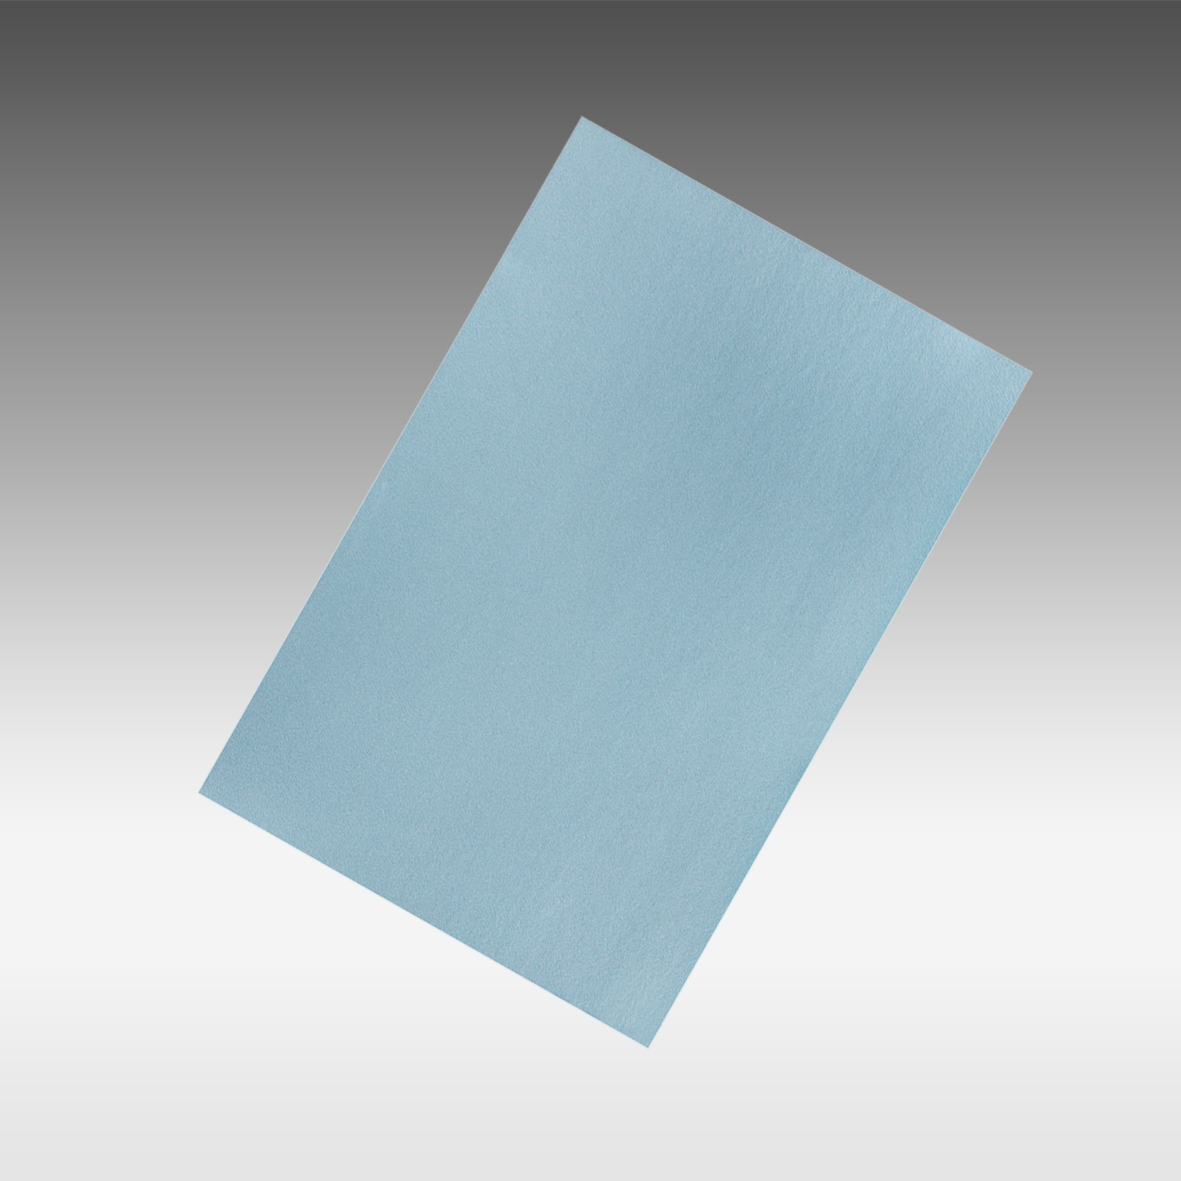 siaflex schuurpapier